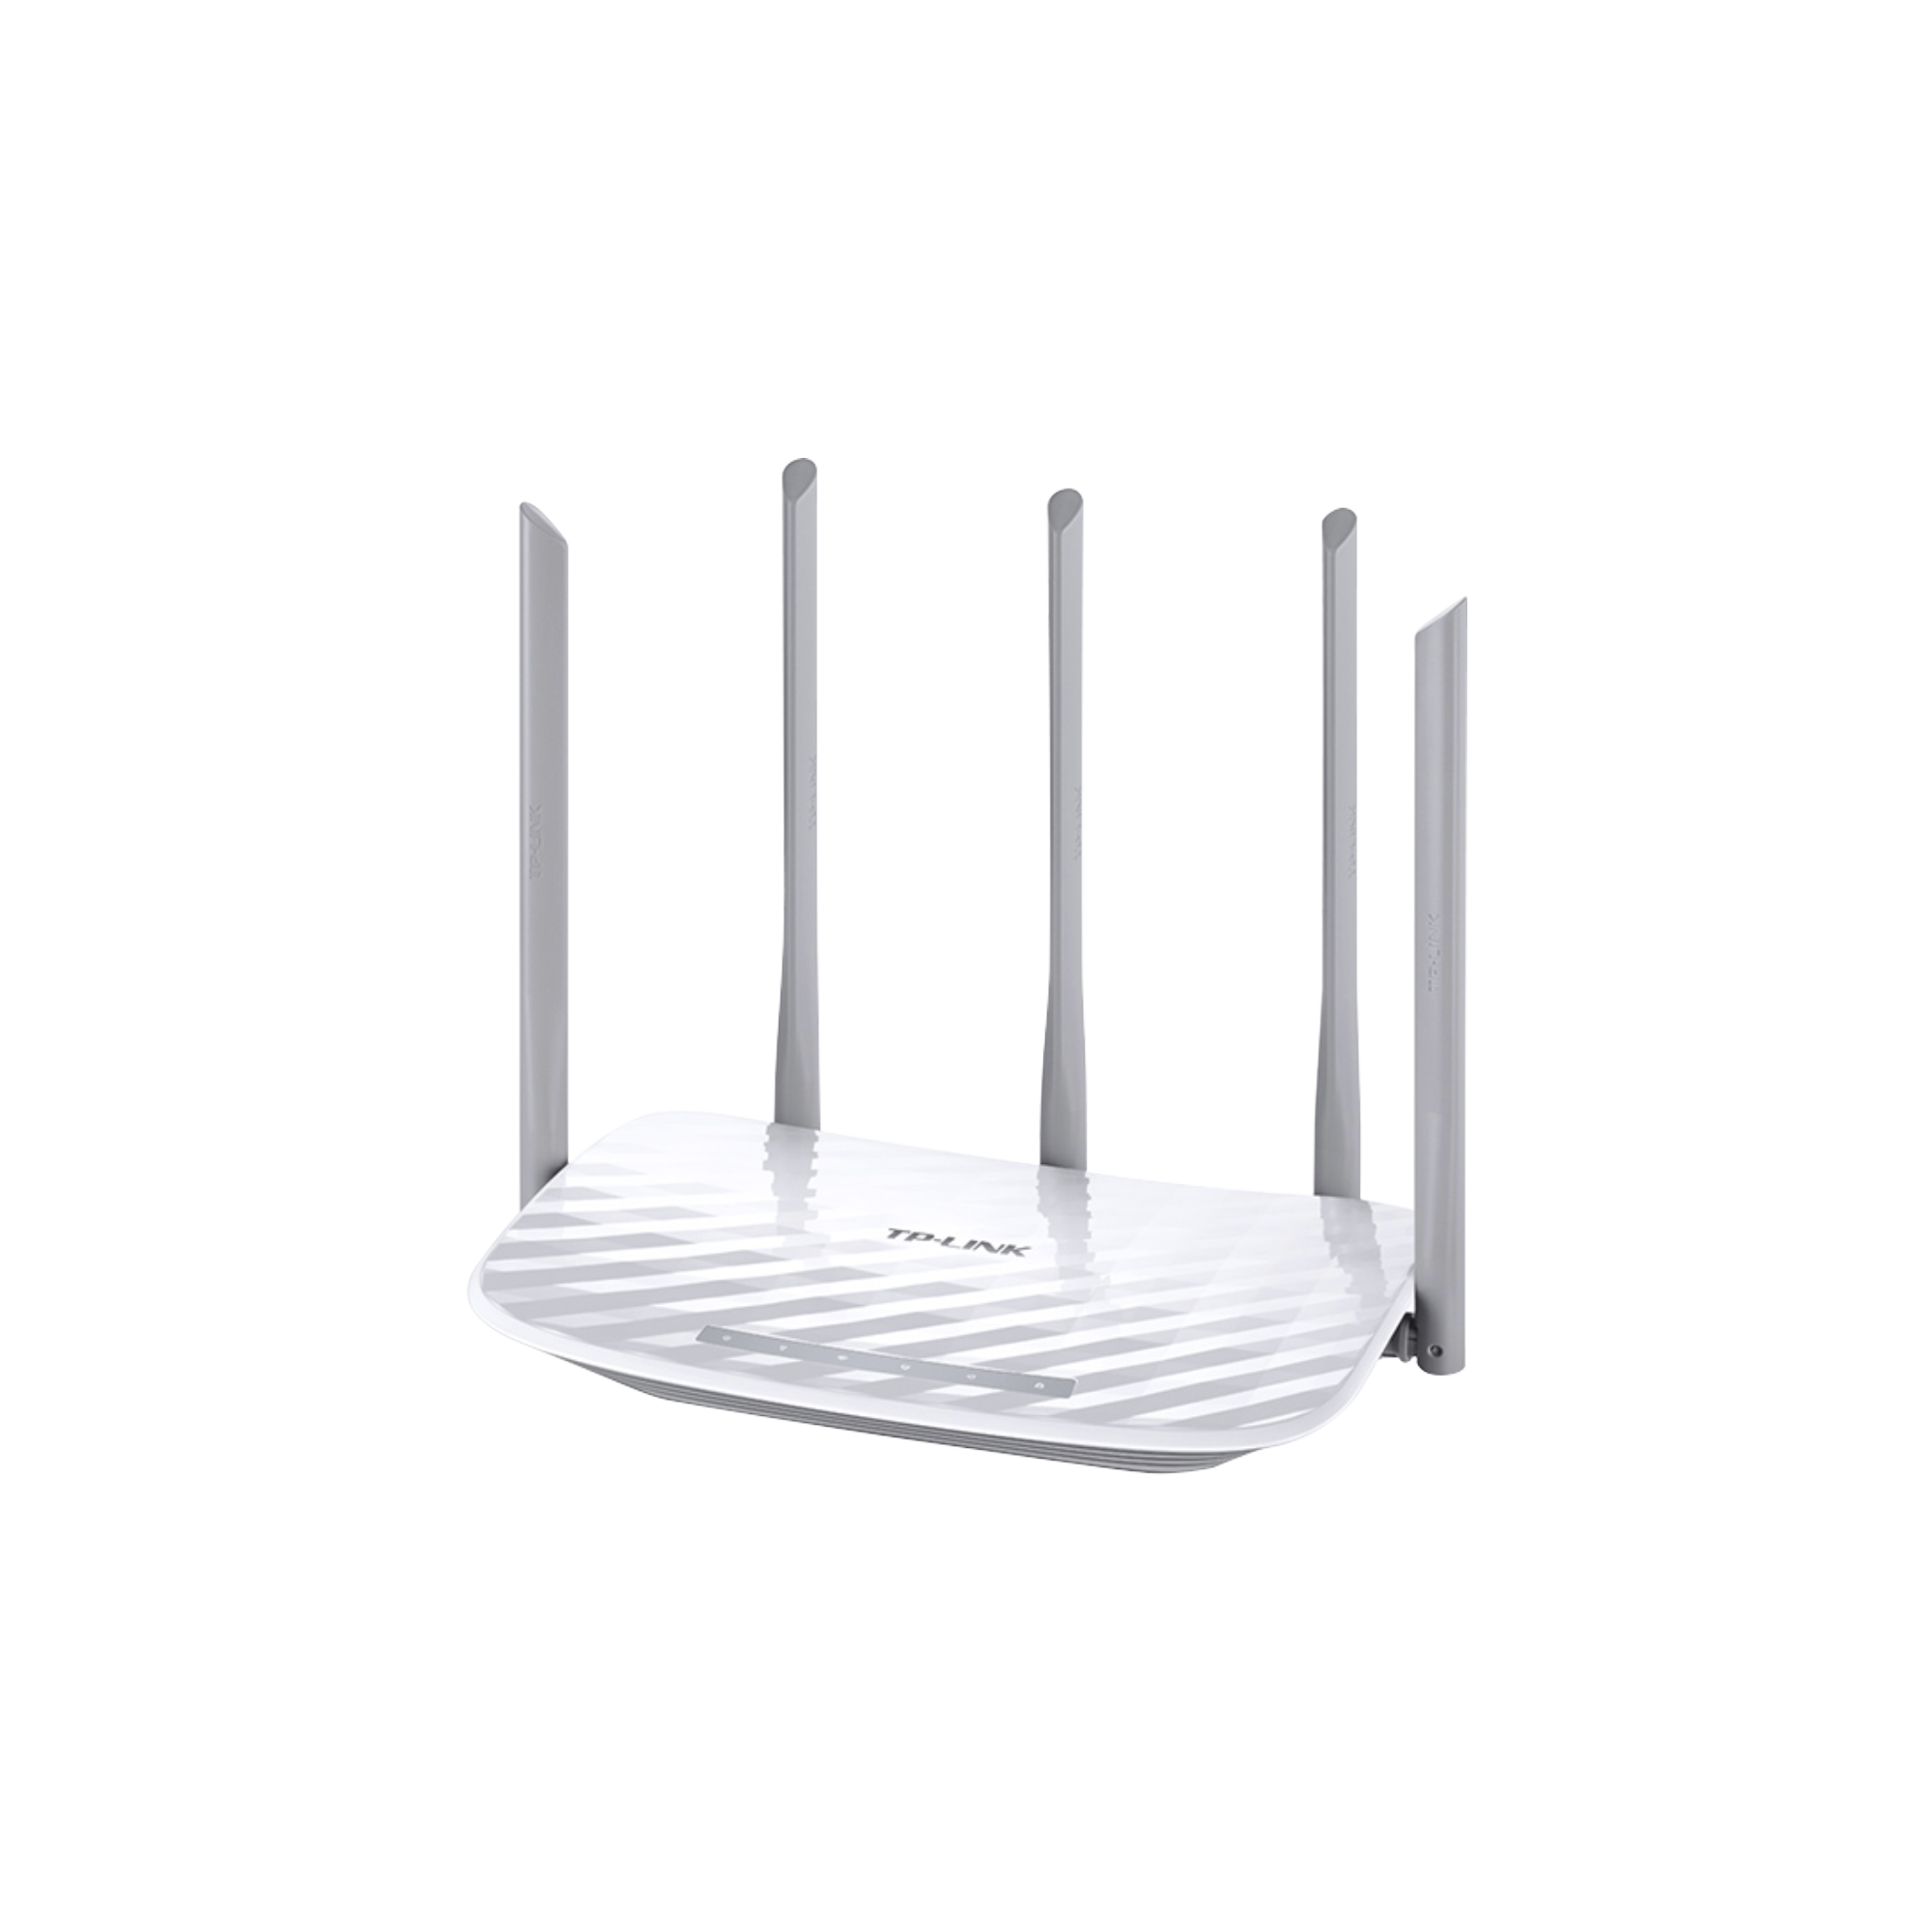 Router Inalámbrico doble banda AC, 2.4 GHz y 5 GHz Hasta 1350 Mbps, 5 antenas externas omnidireccional, 4 Puertos LAN 10/100 Mbps, 1 Puerto WAN 10/100 Mbps